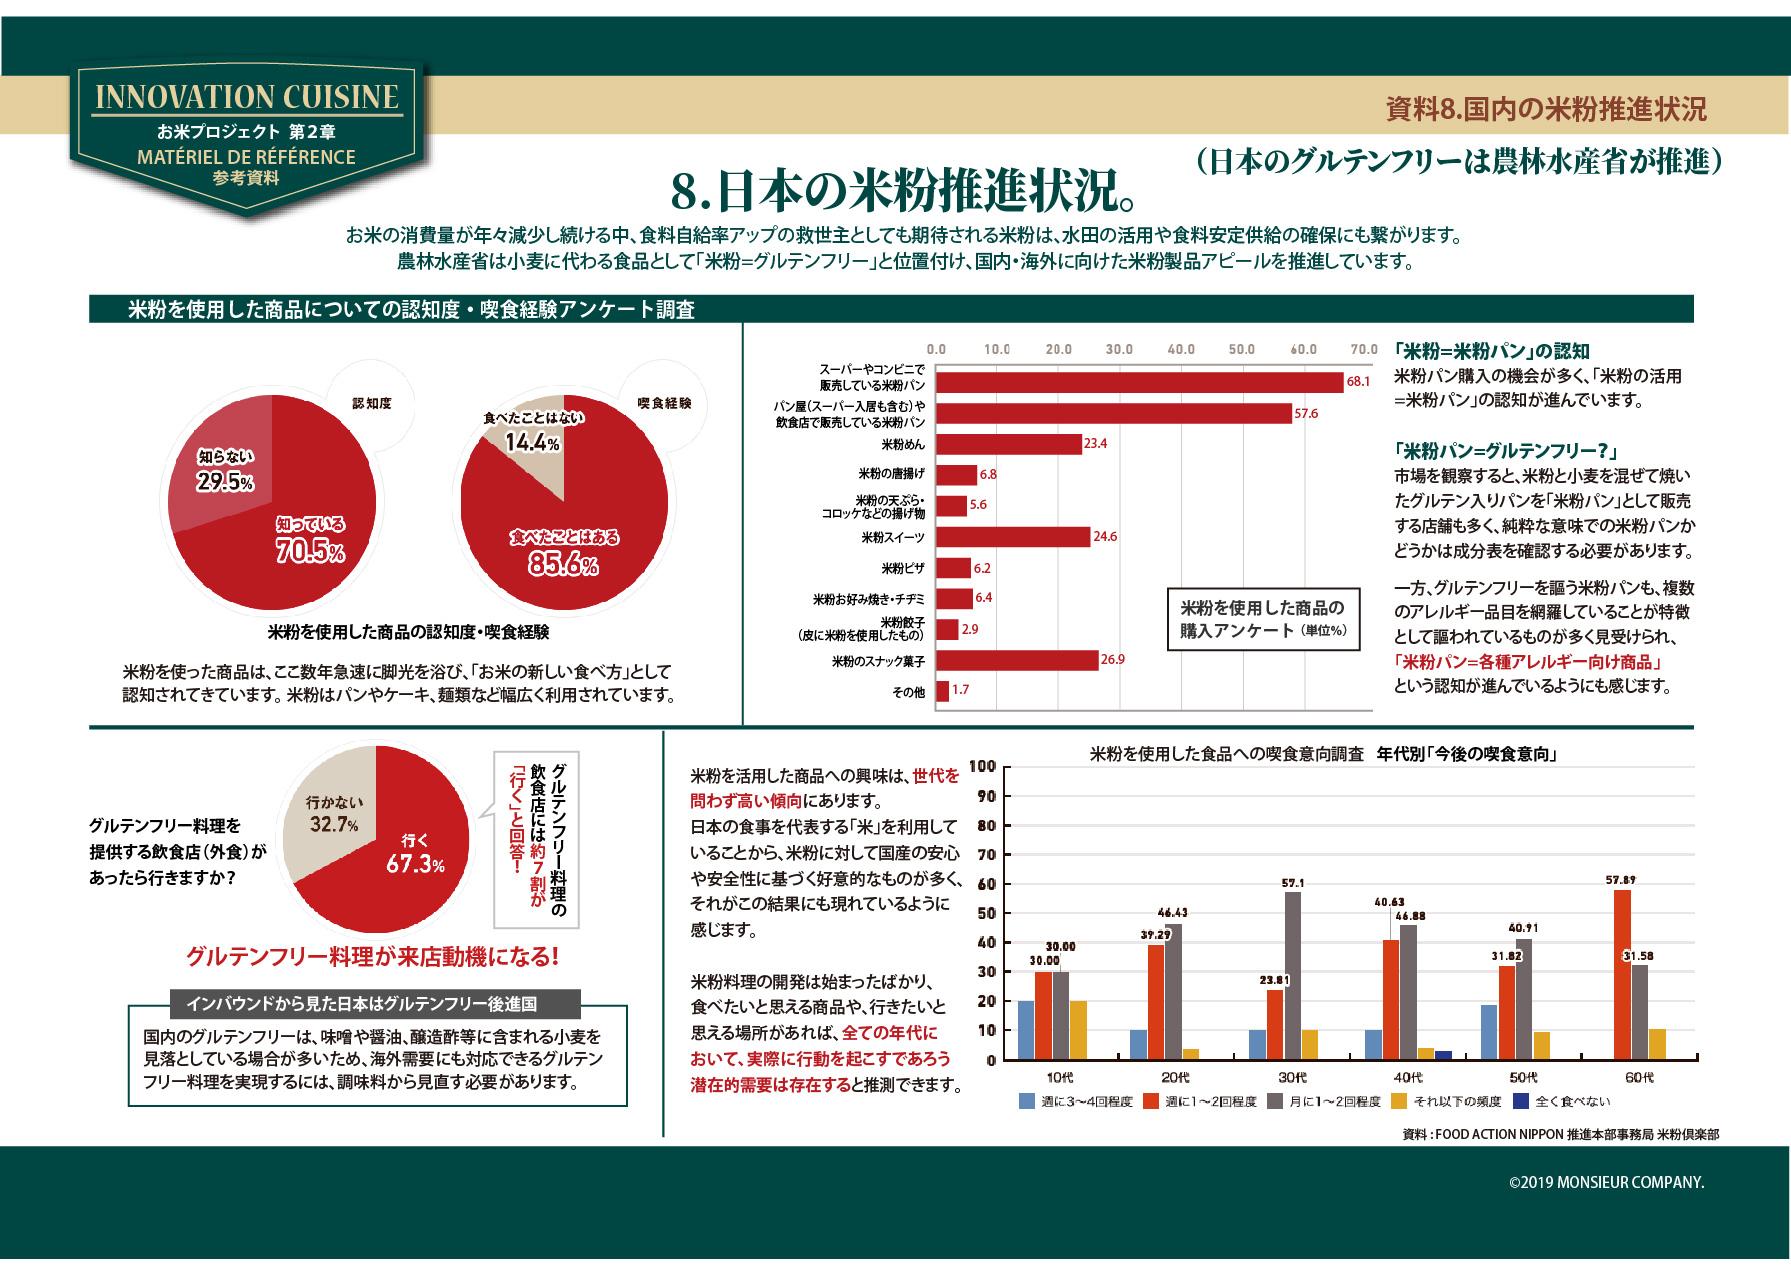 Pお米プロジェクト_17P 資料 日本のグルテンフリー